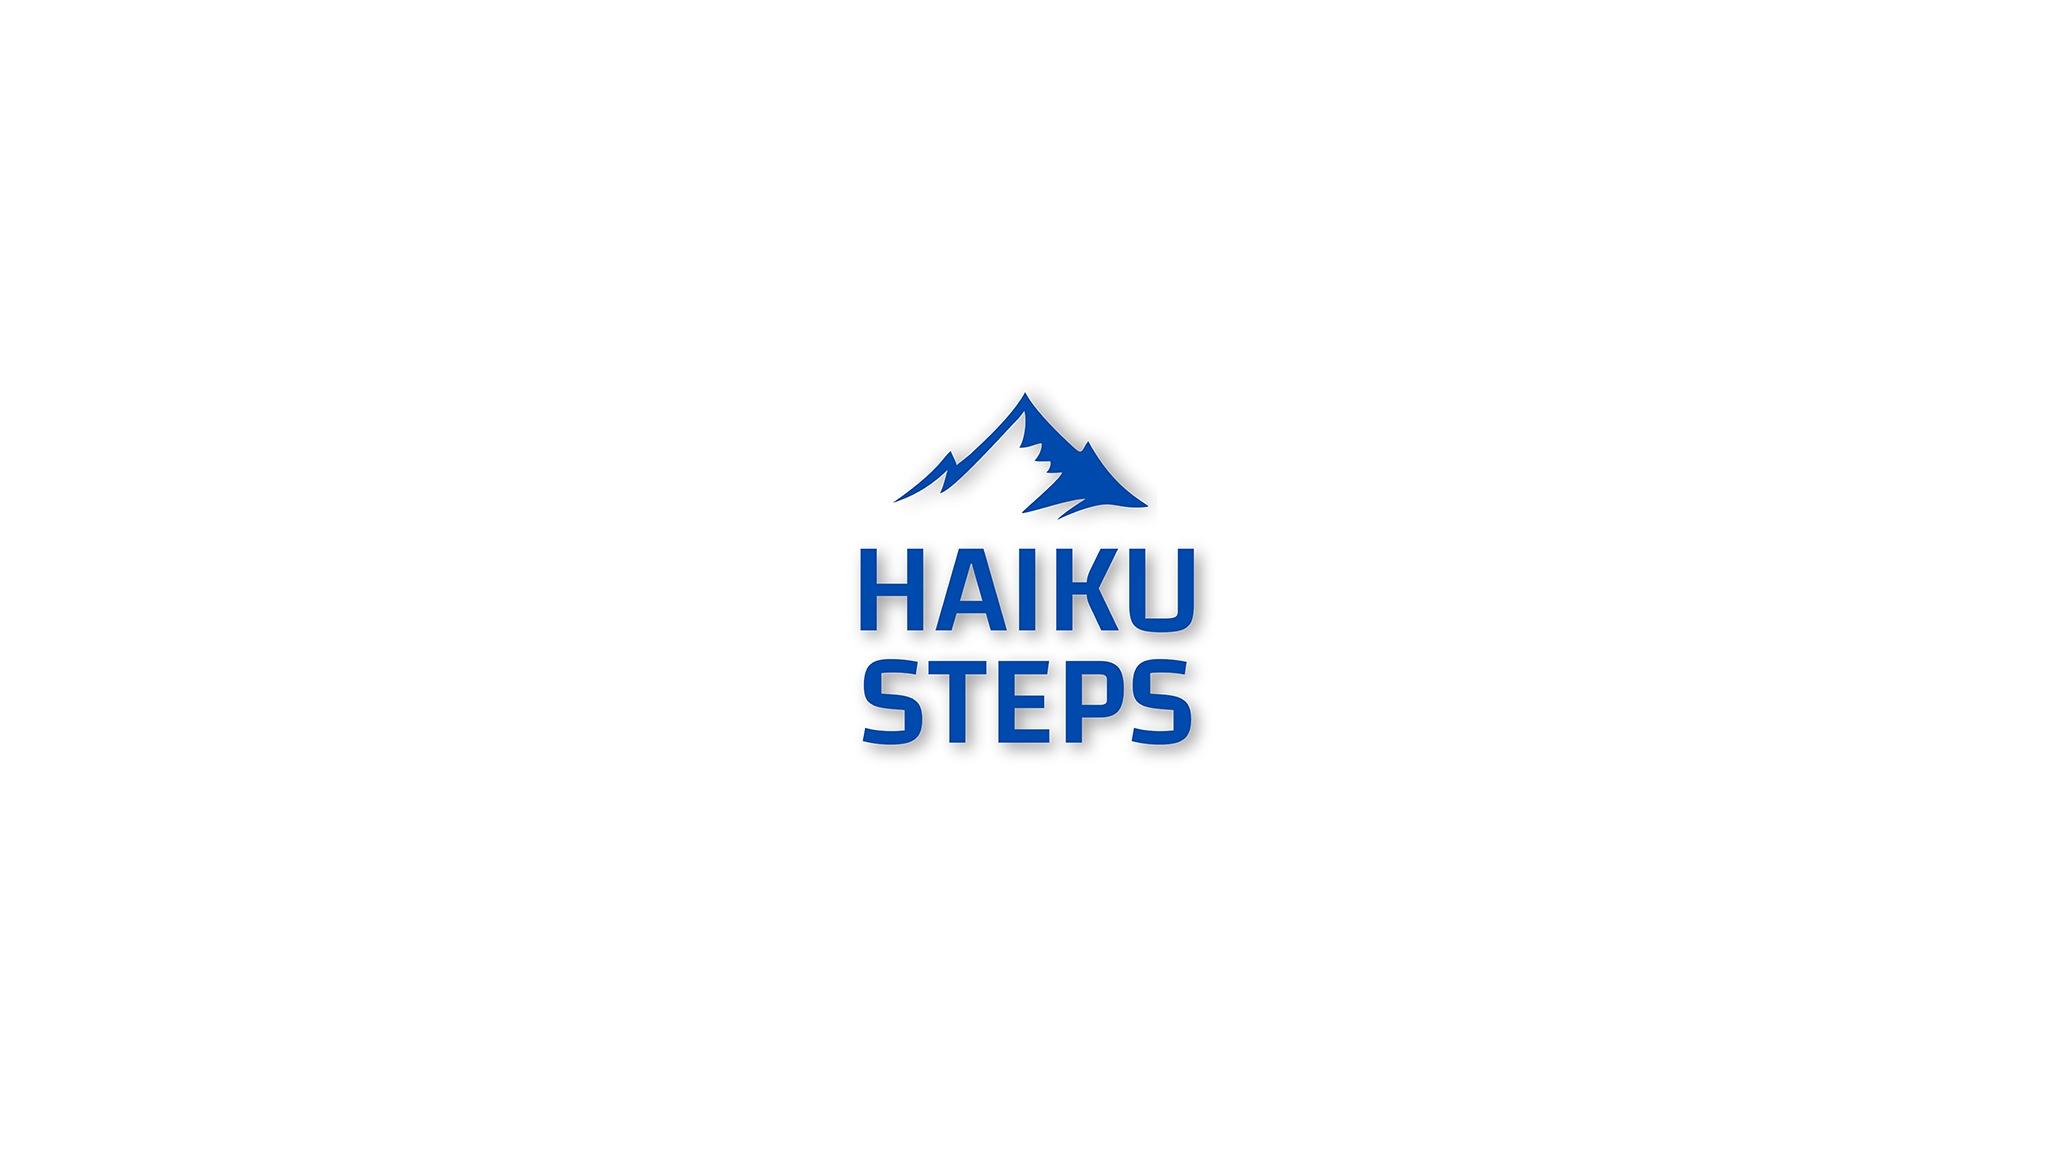 Haiku Steps Toronto - Digital Marketing Agency, SE (@haikustepstorontoseo) Cover Image